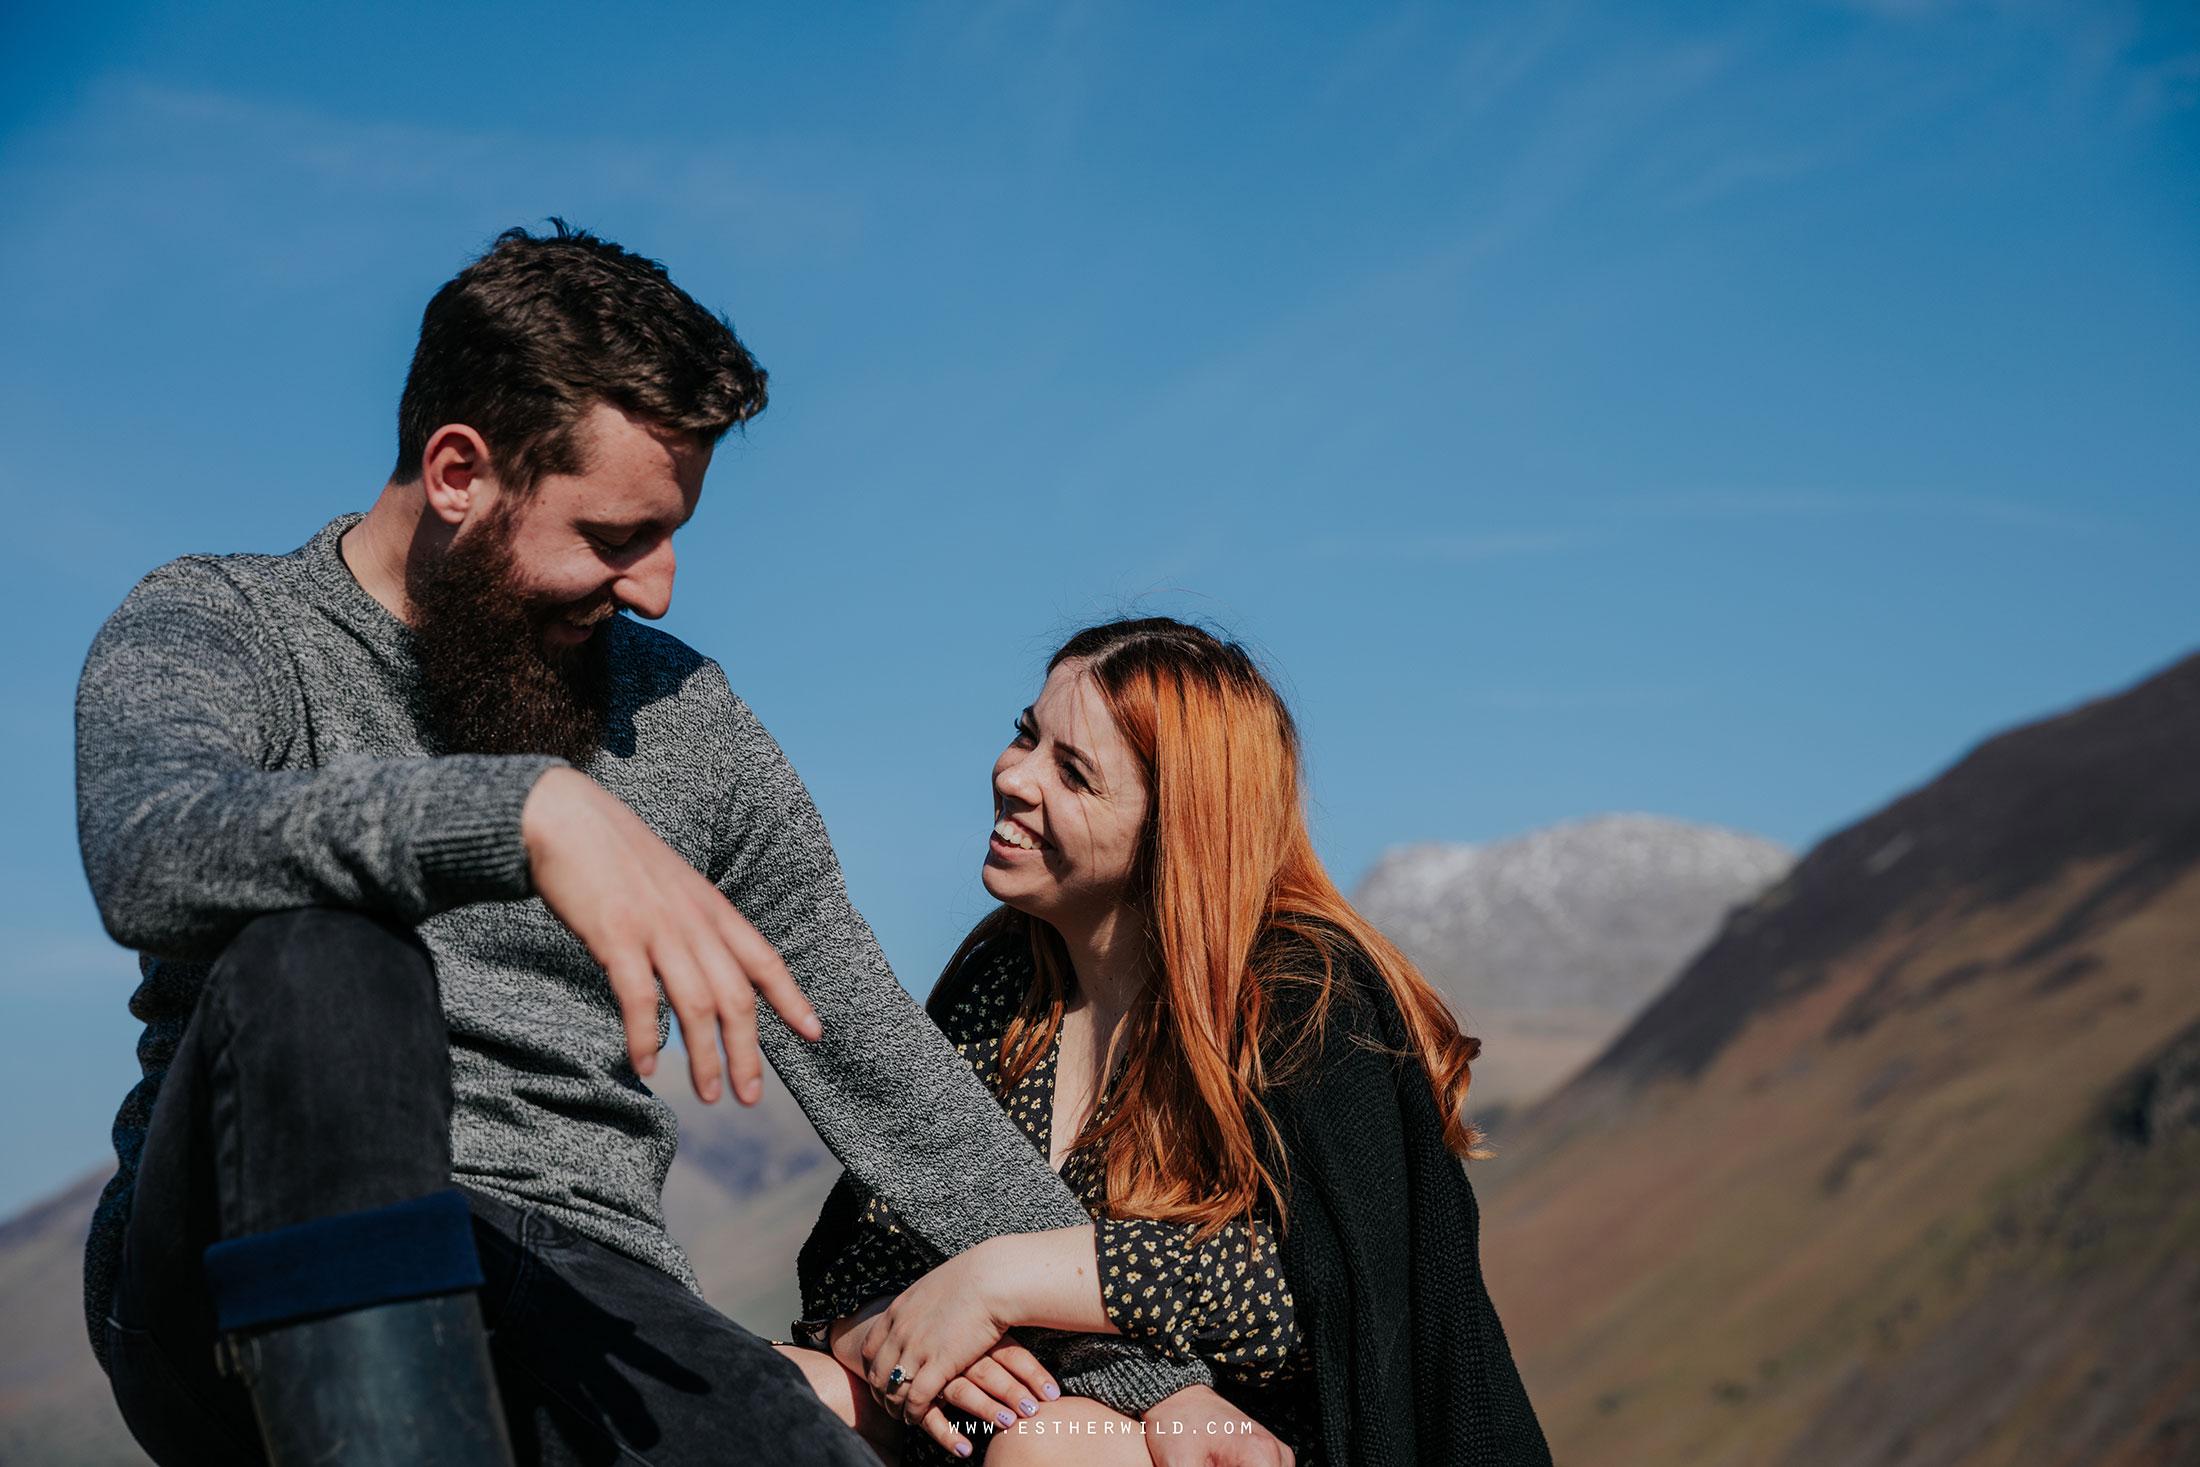 Cumbria_Lake_District_Wasdale_Wedding_Photographer_Destination_Engagement_Anniversary_Esther_Wild_IMG_3388.jpg